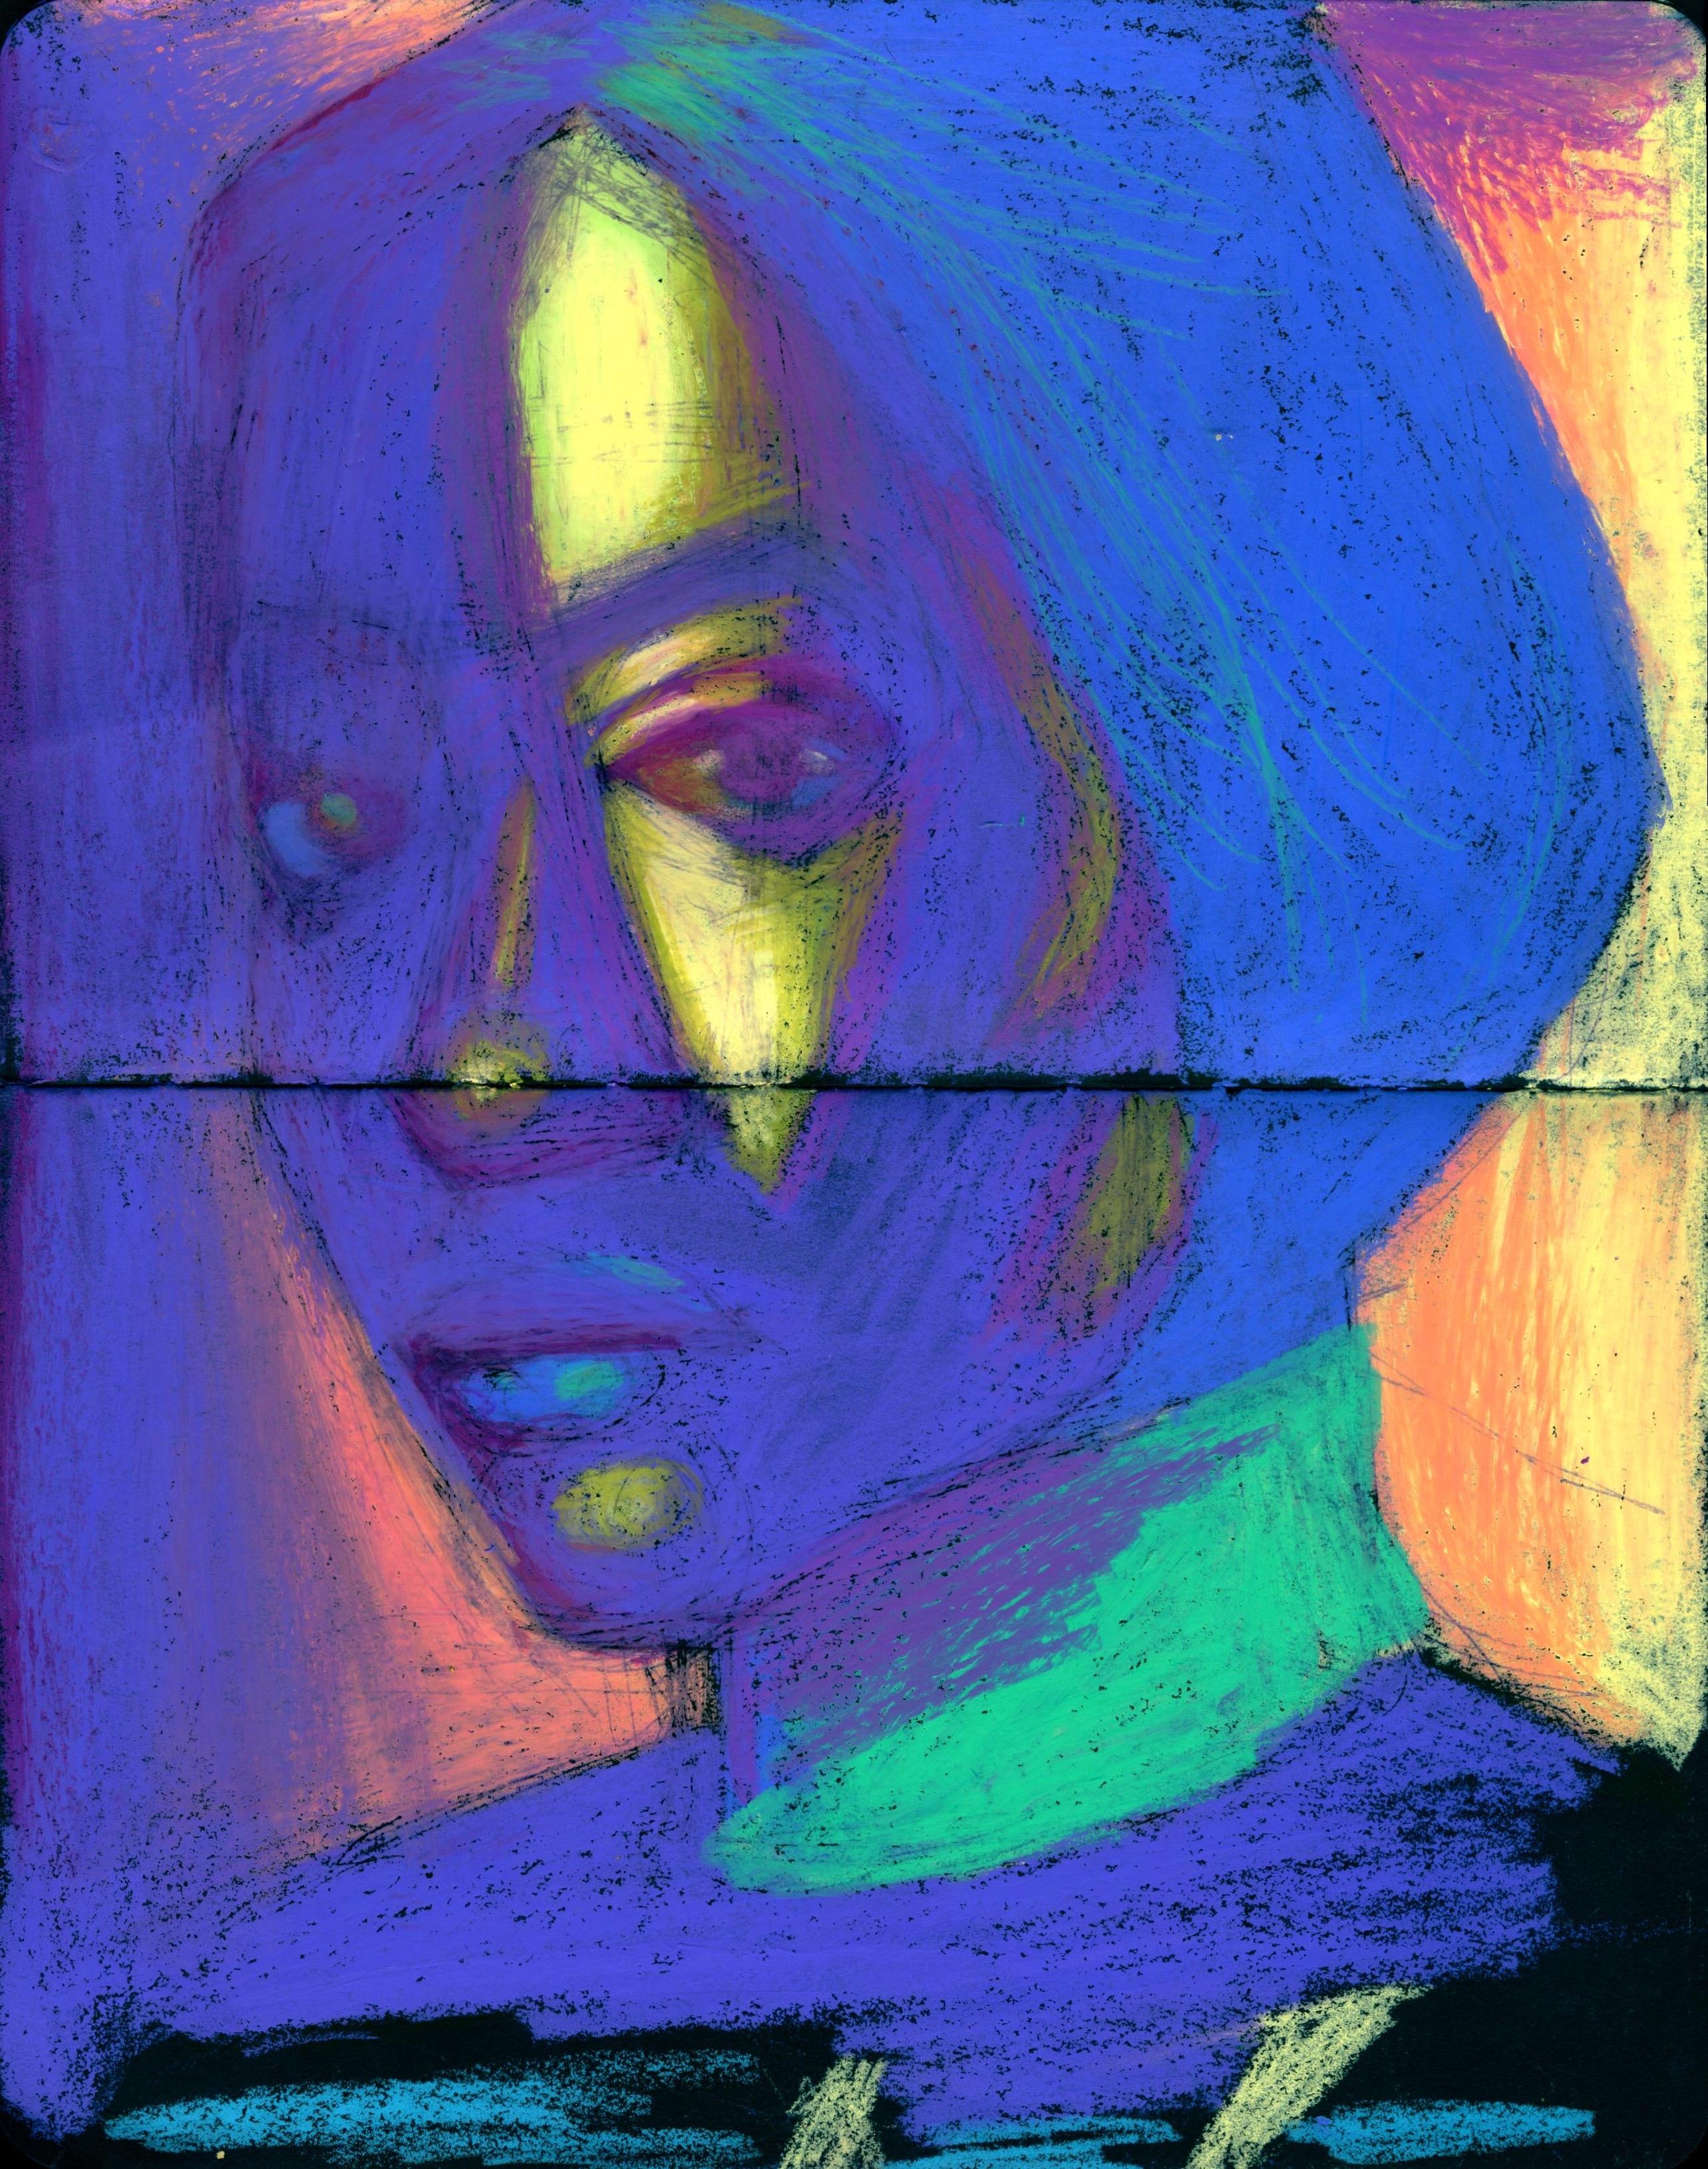 <b>Technicolour</b>